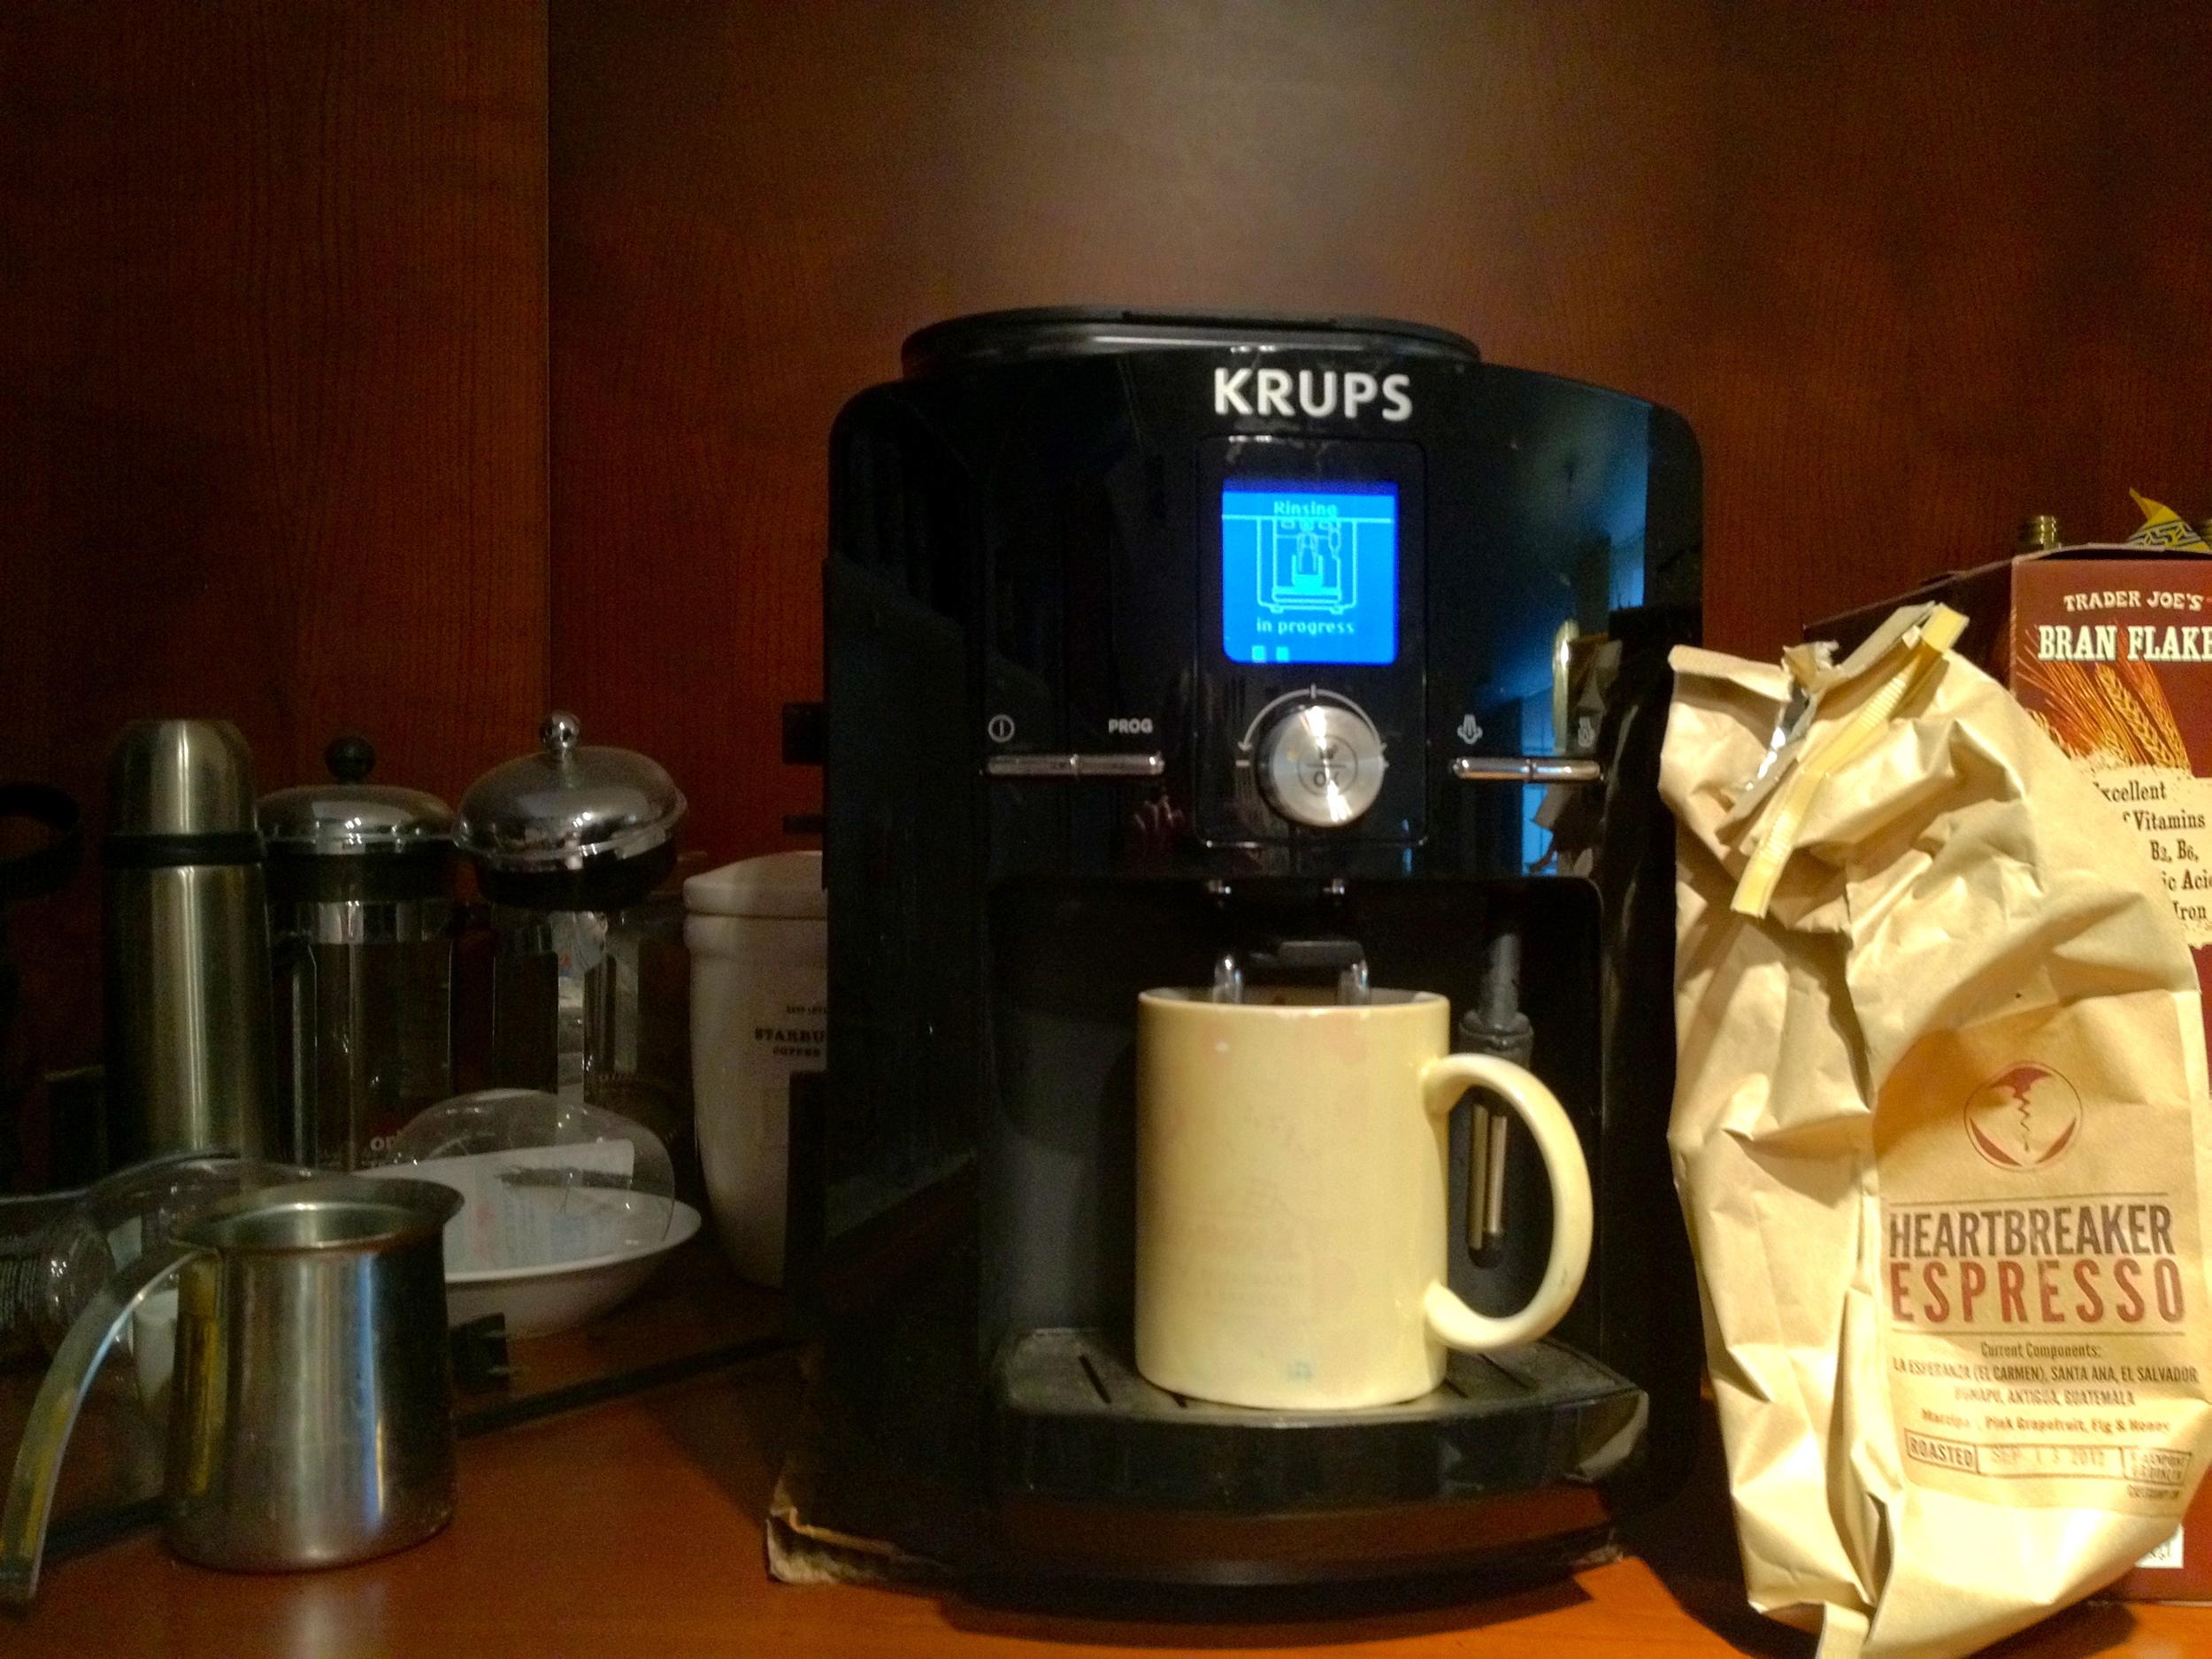 The Krups Espressaria full automatic espresso machine.